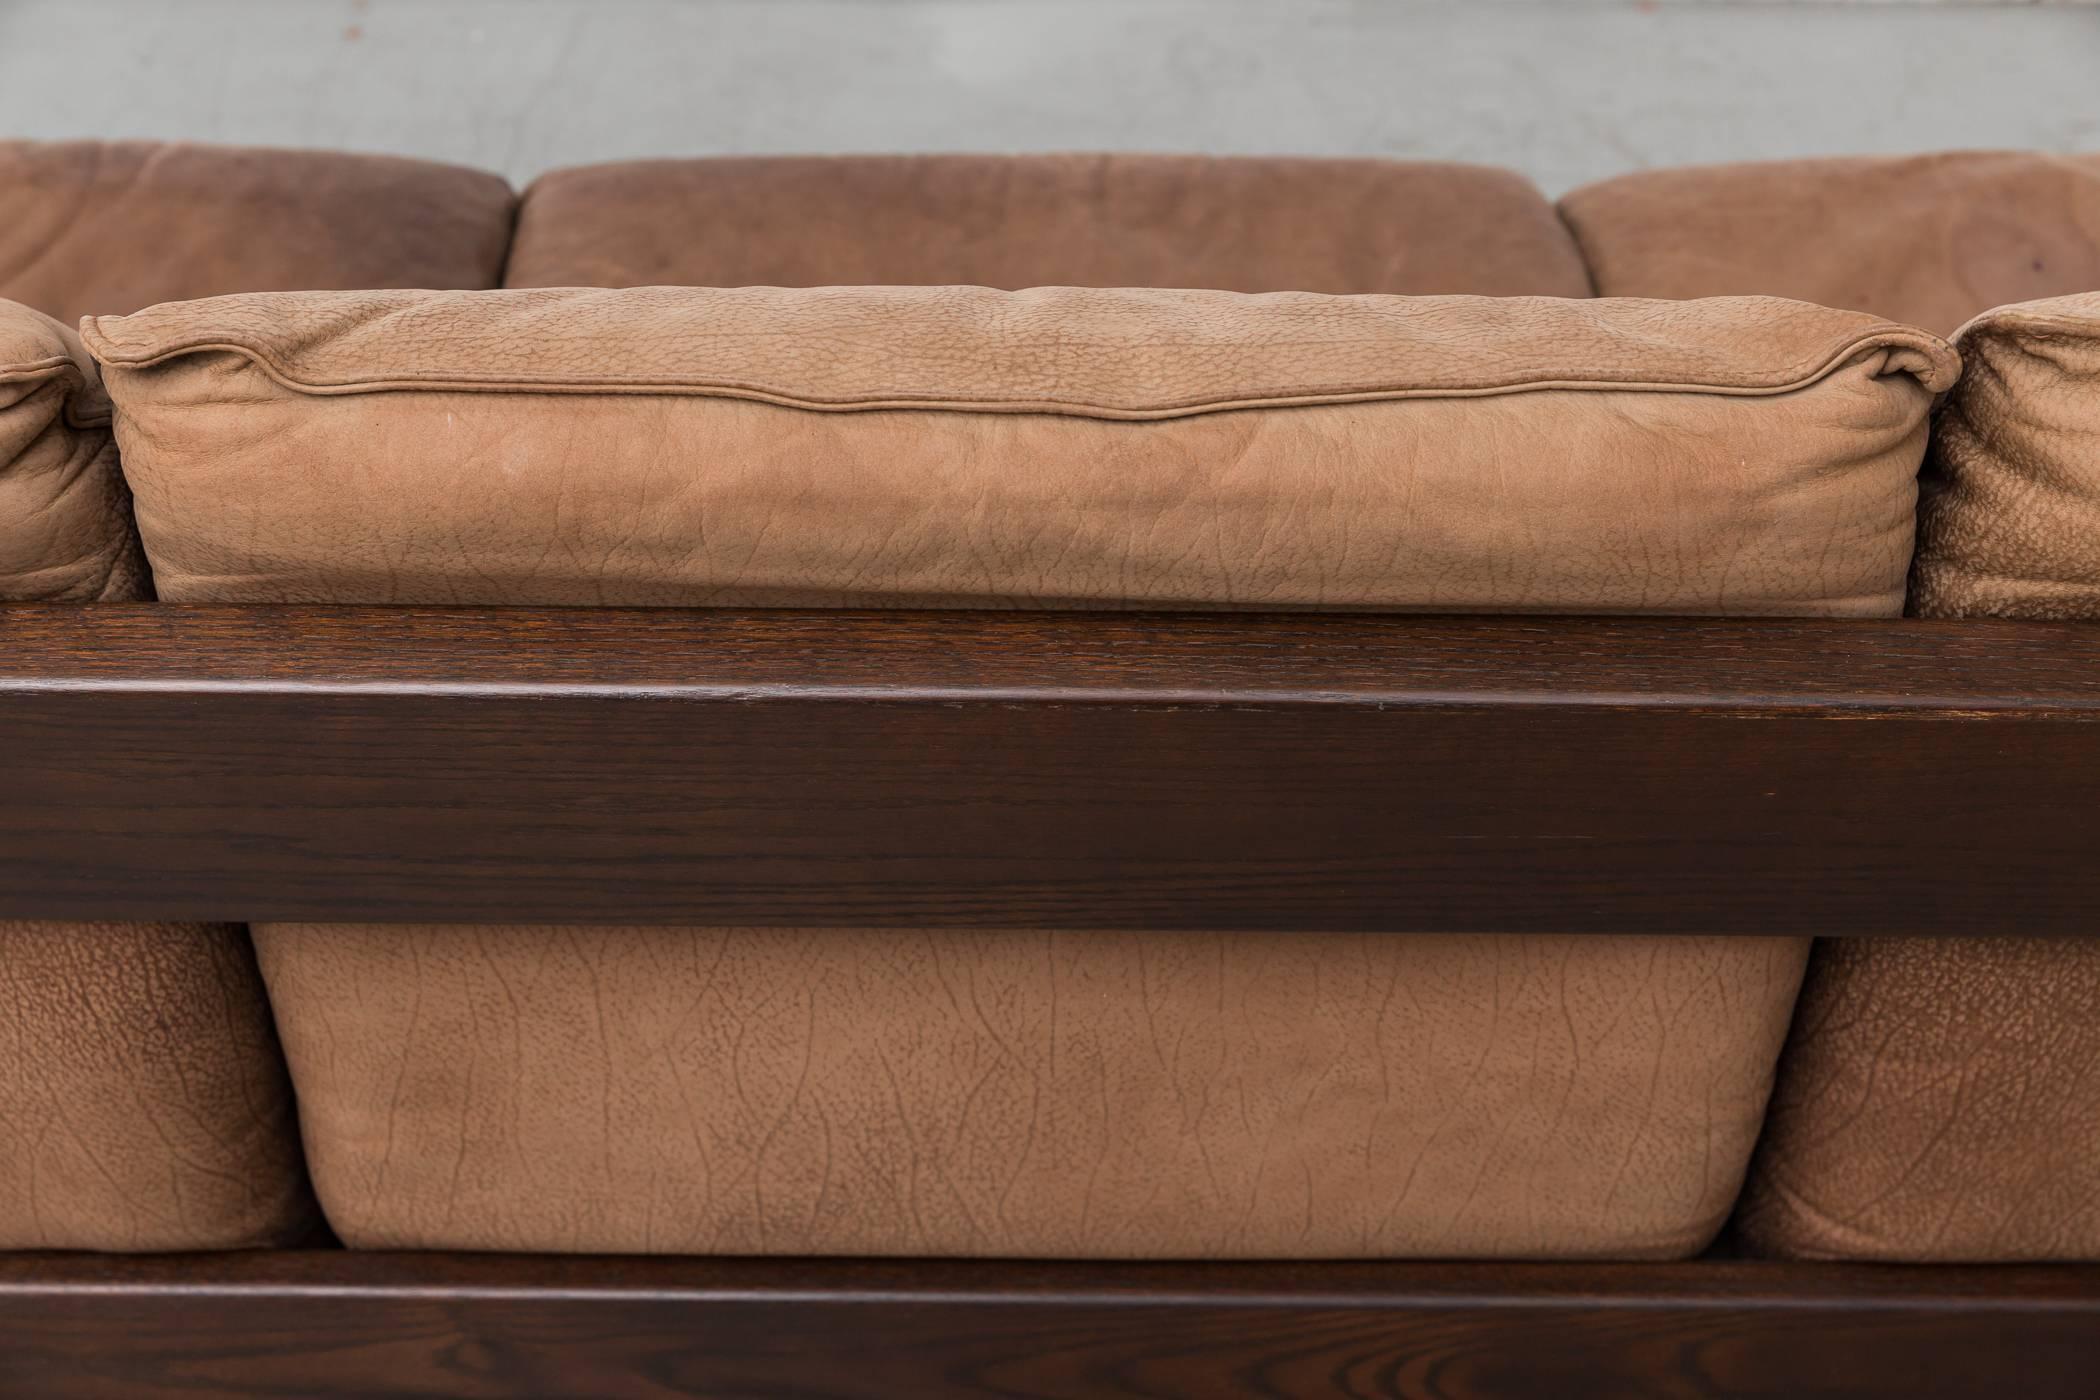 Leolux Three-Seat Buffalo Leather and Wenge Sofa For Sale at 1stdibs